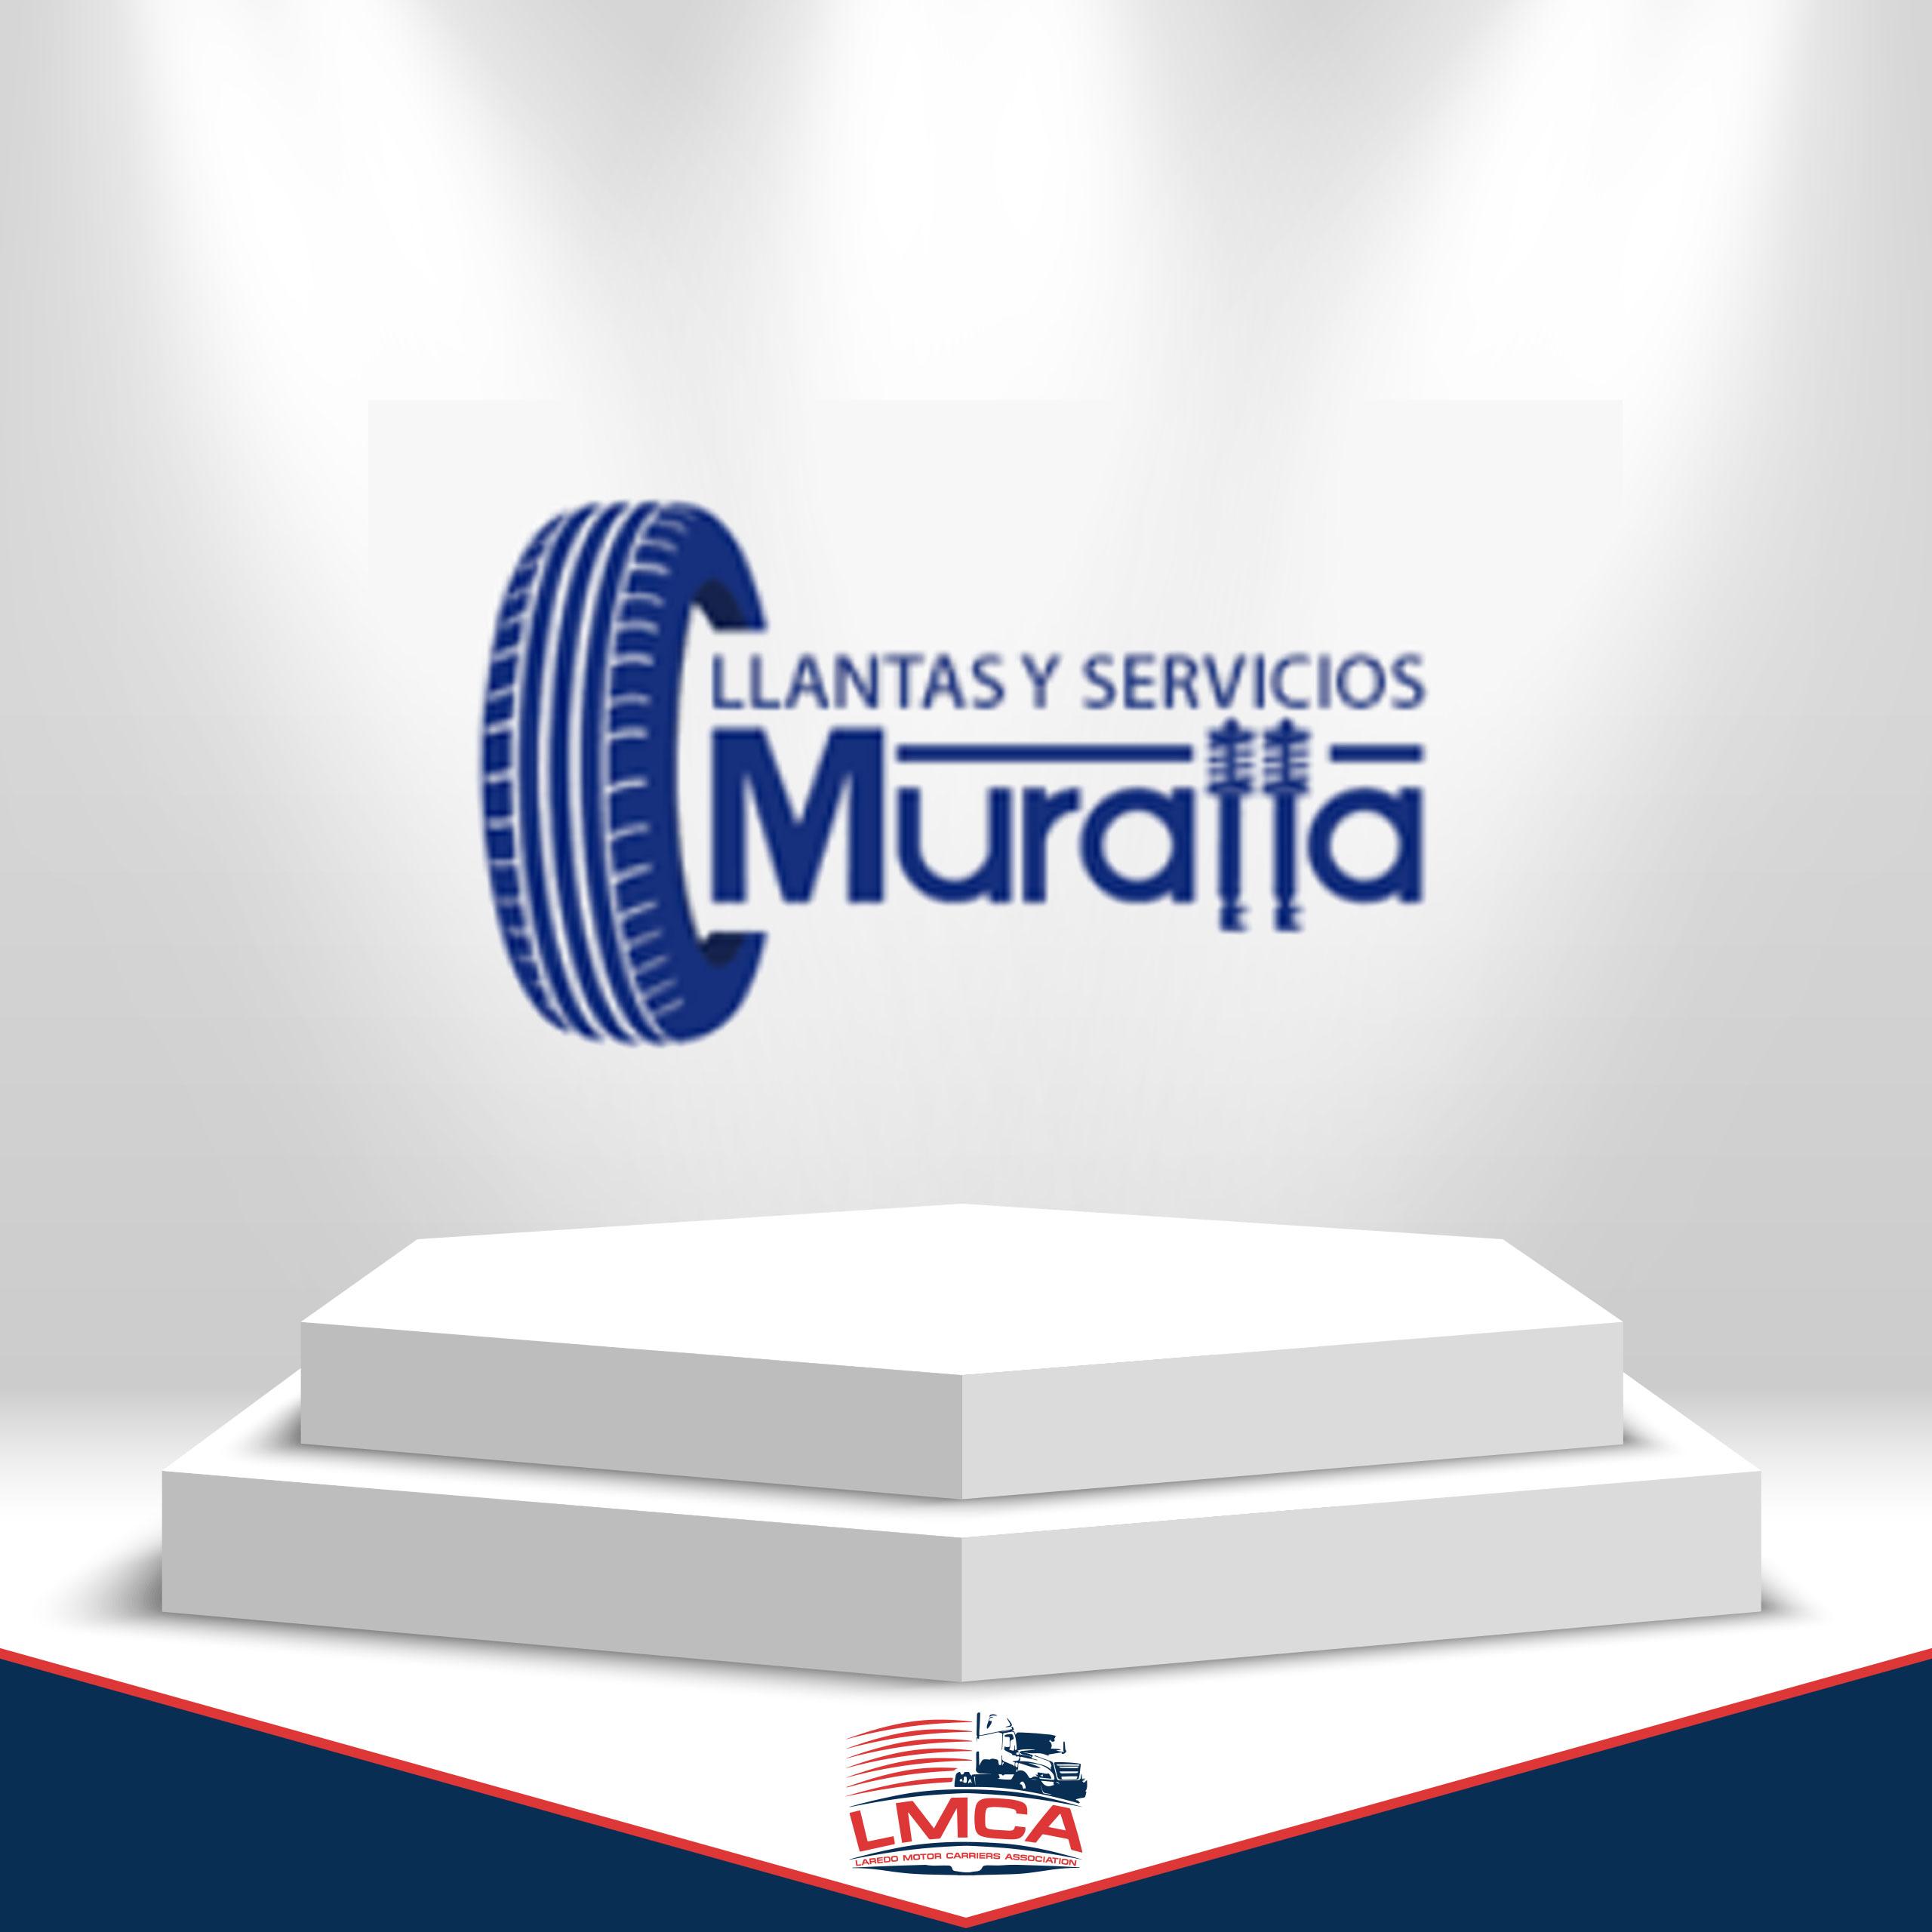 MURALLA-LMCA